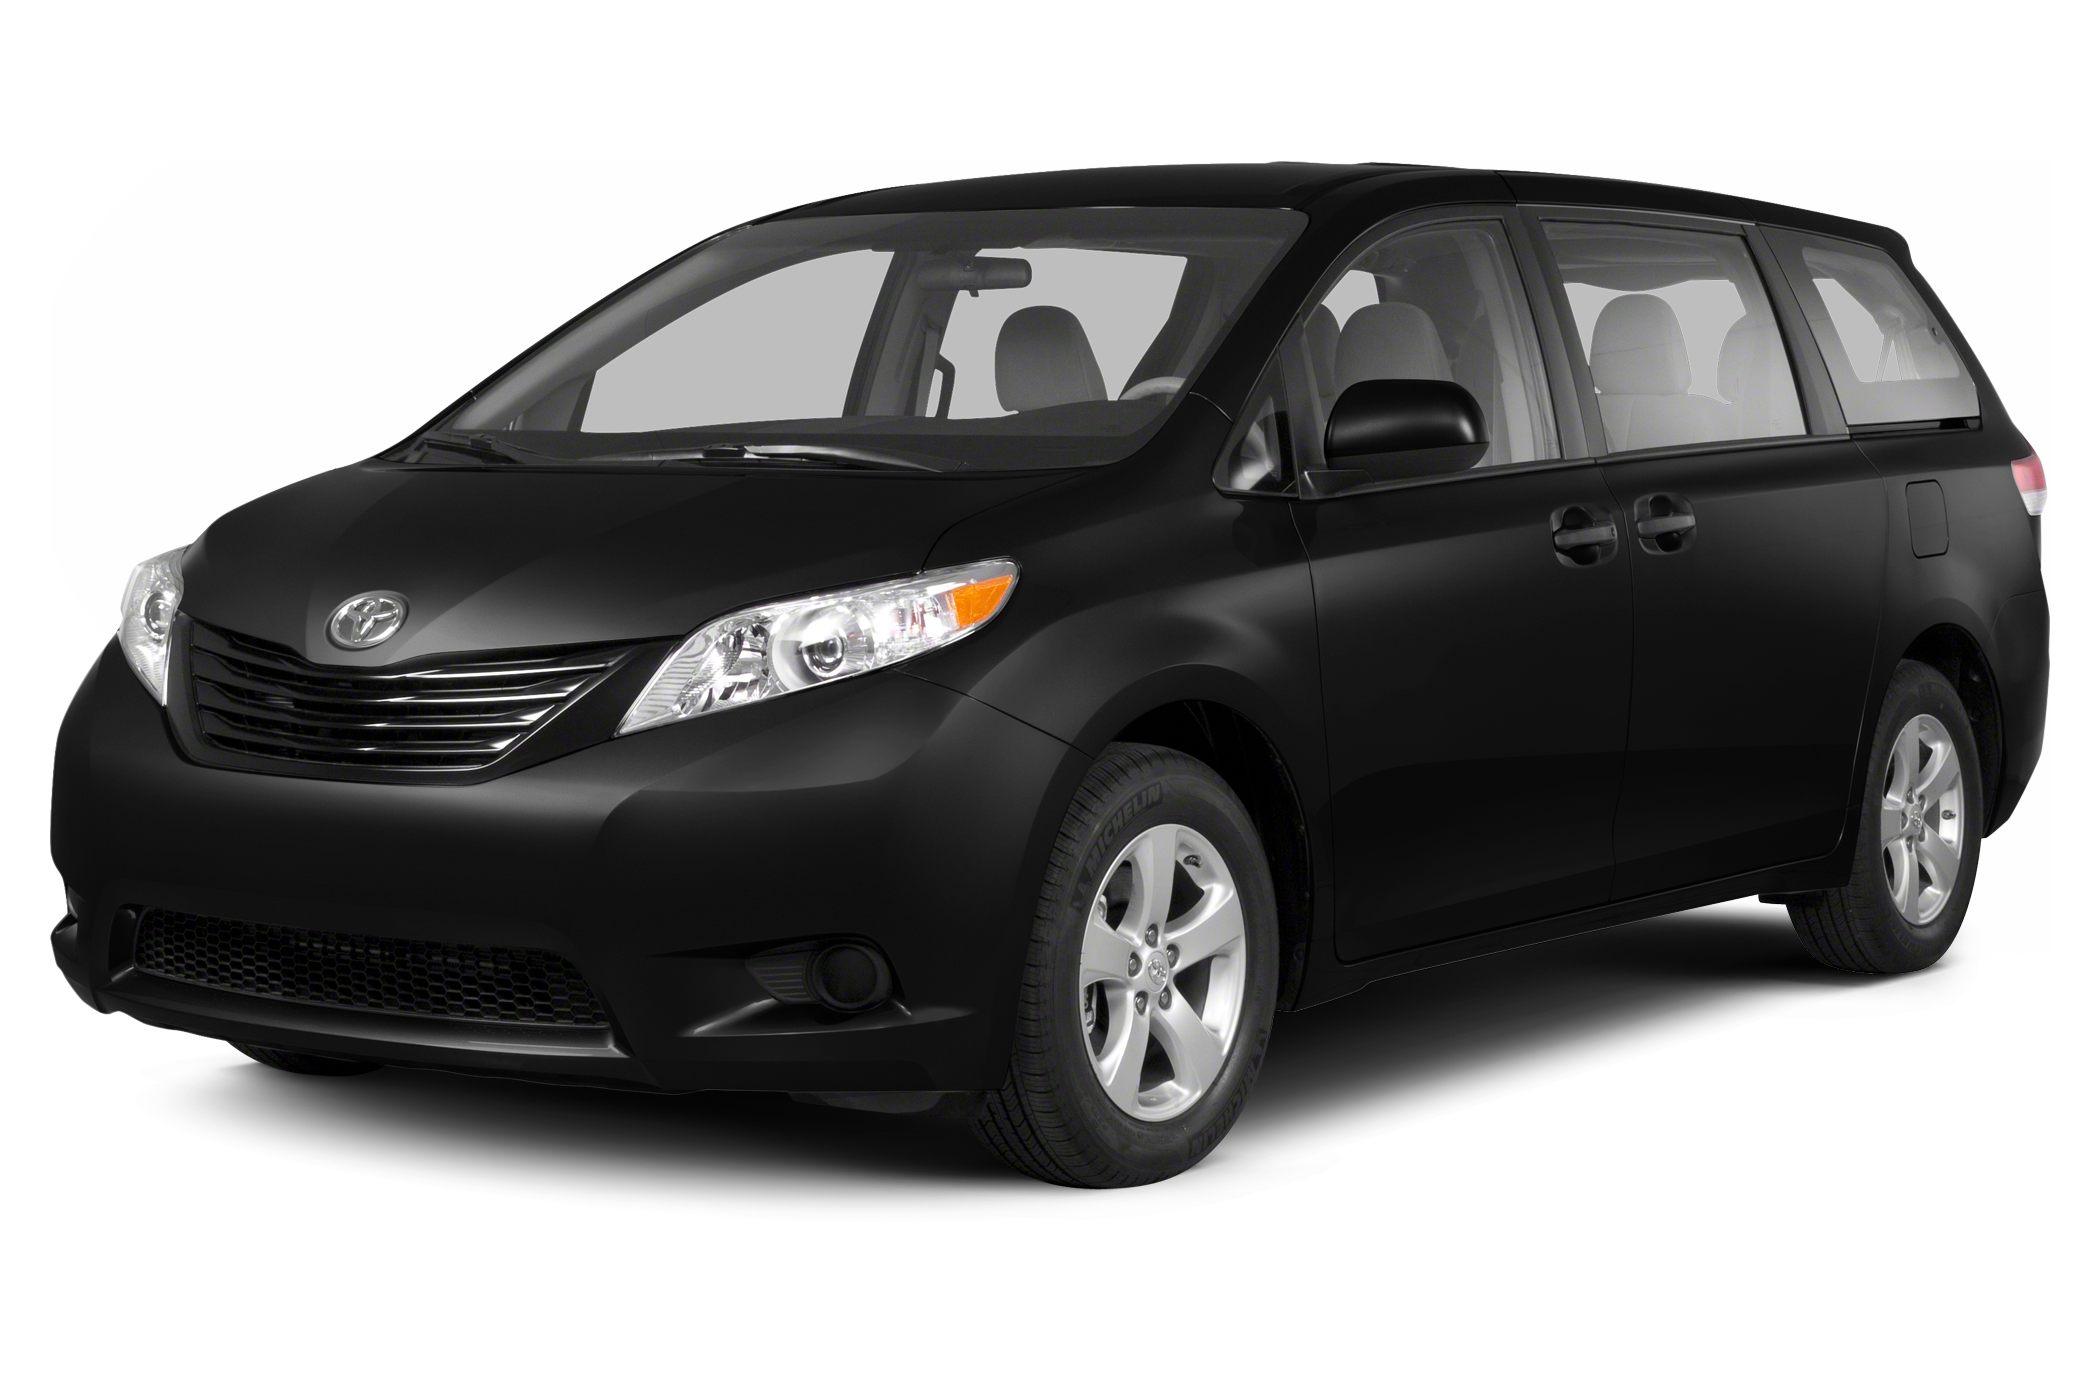 2013 Toyota Sienna New Car Test Drive